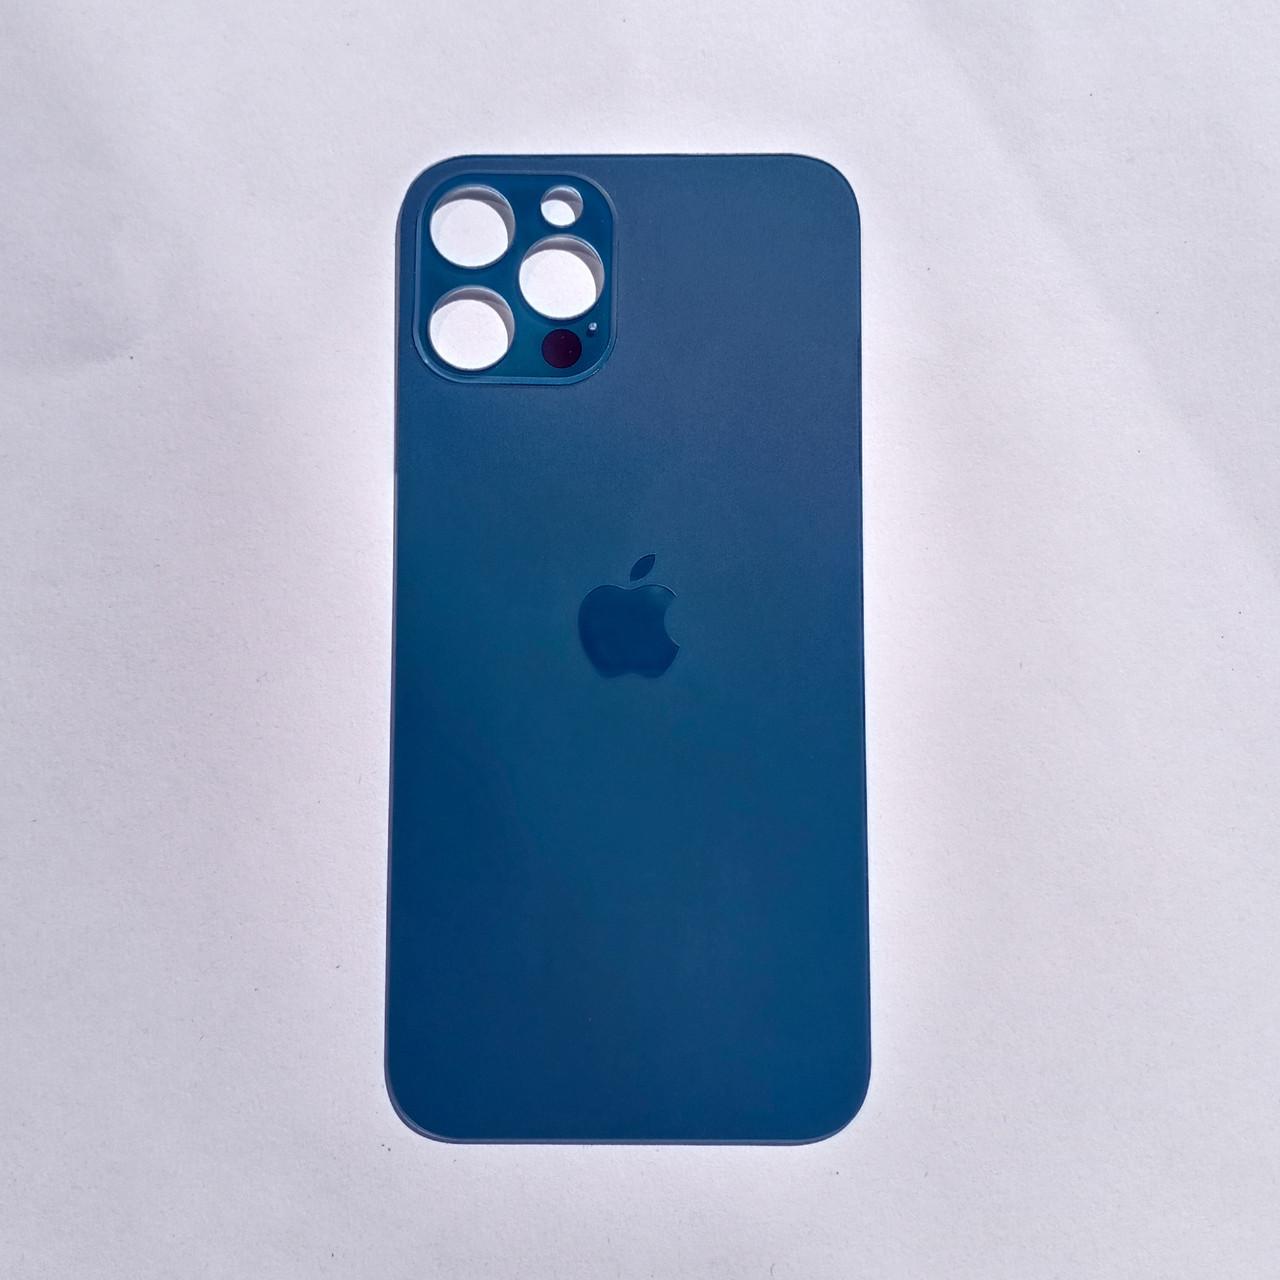 Задня панель корпусу Novacel для Apple iPhone 12 Pro Pacific Blue Big Hole